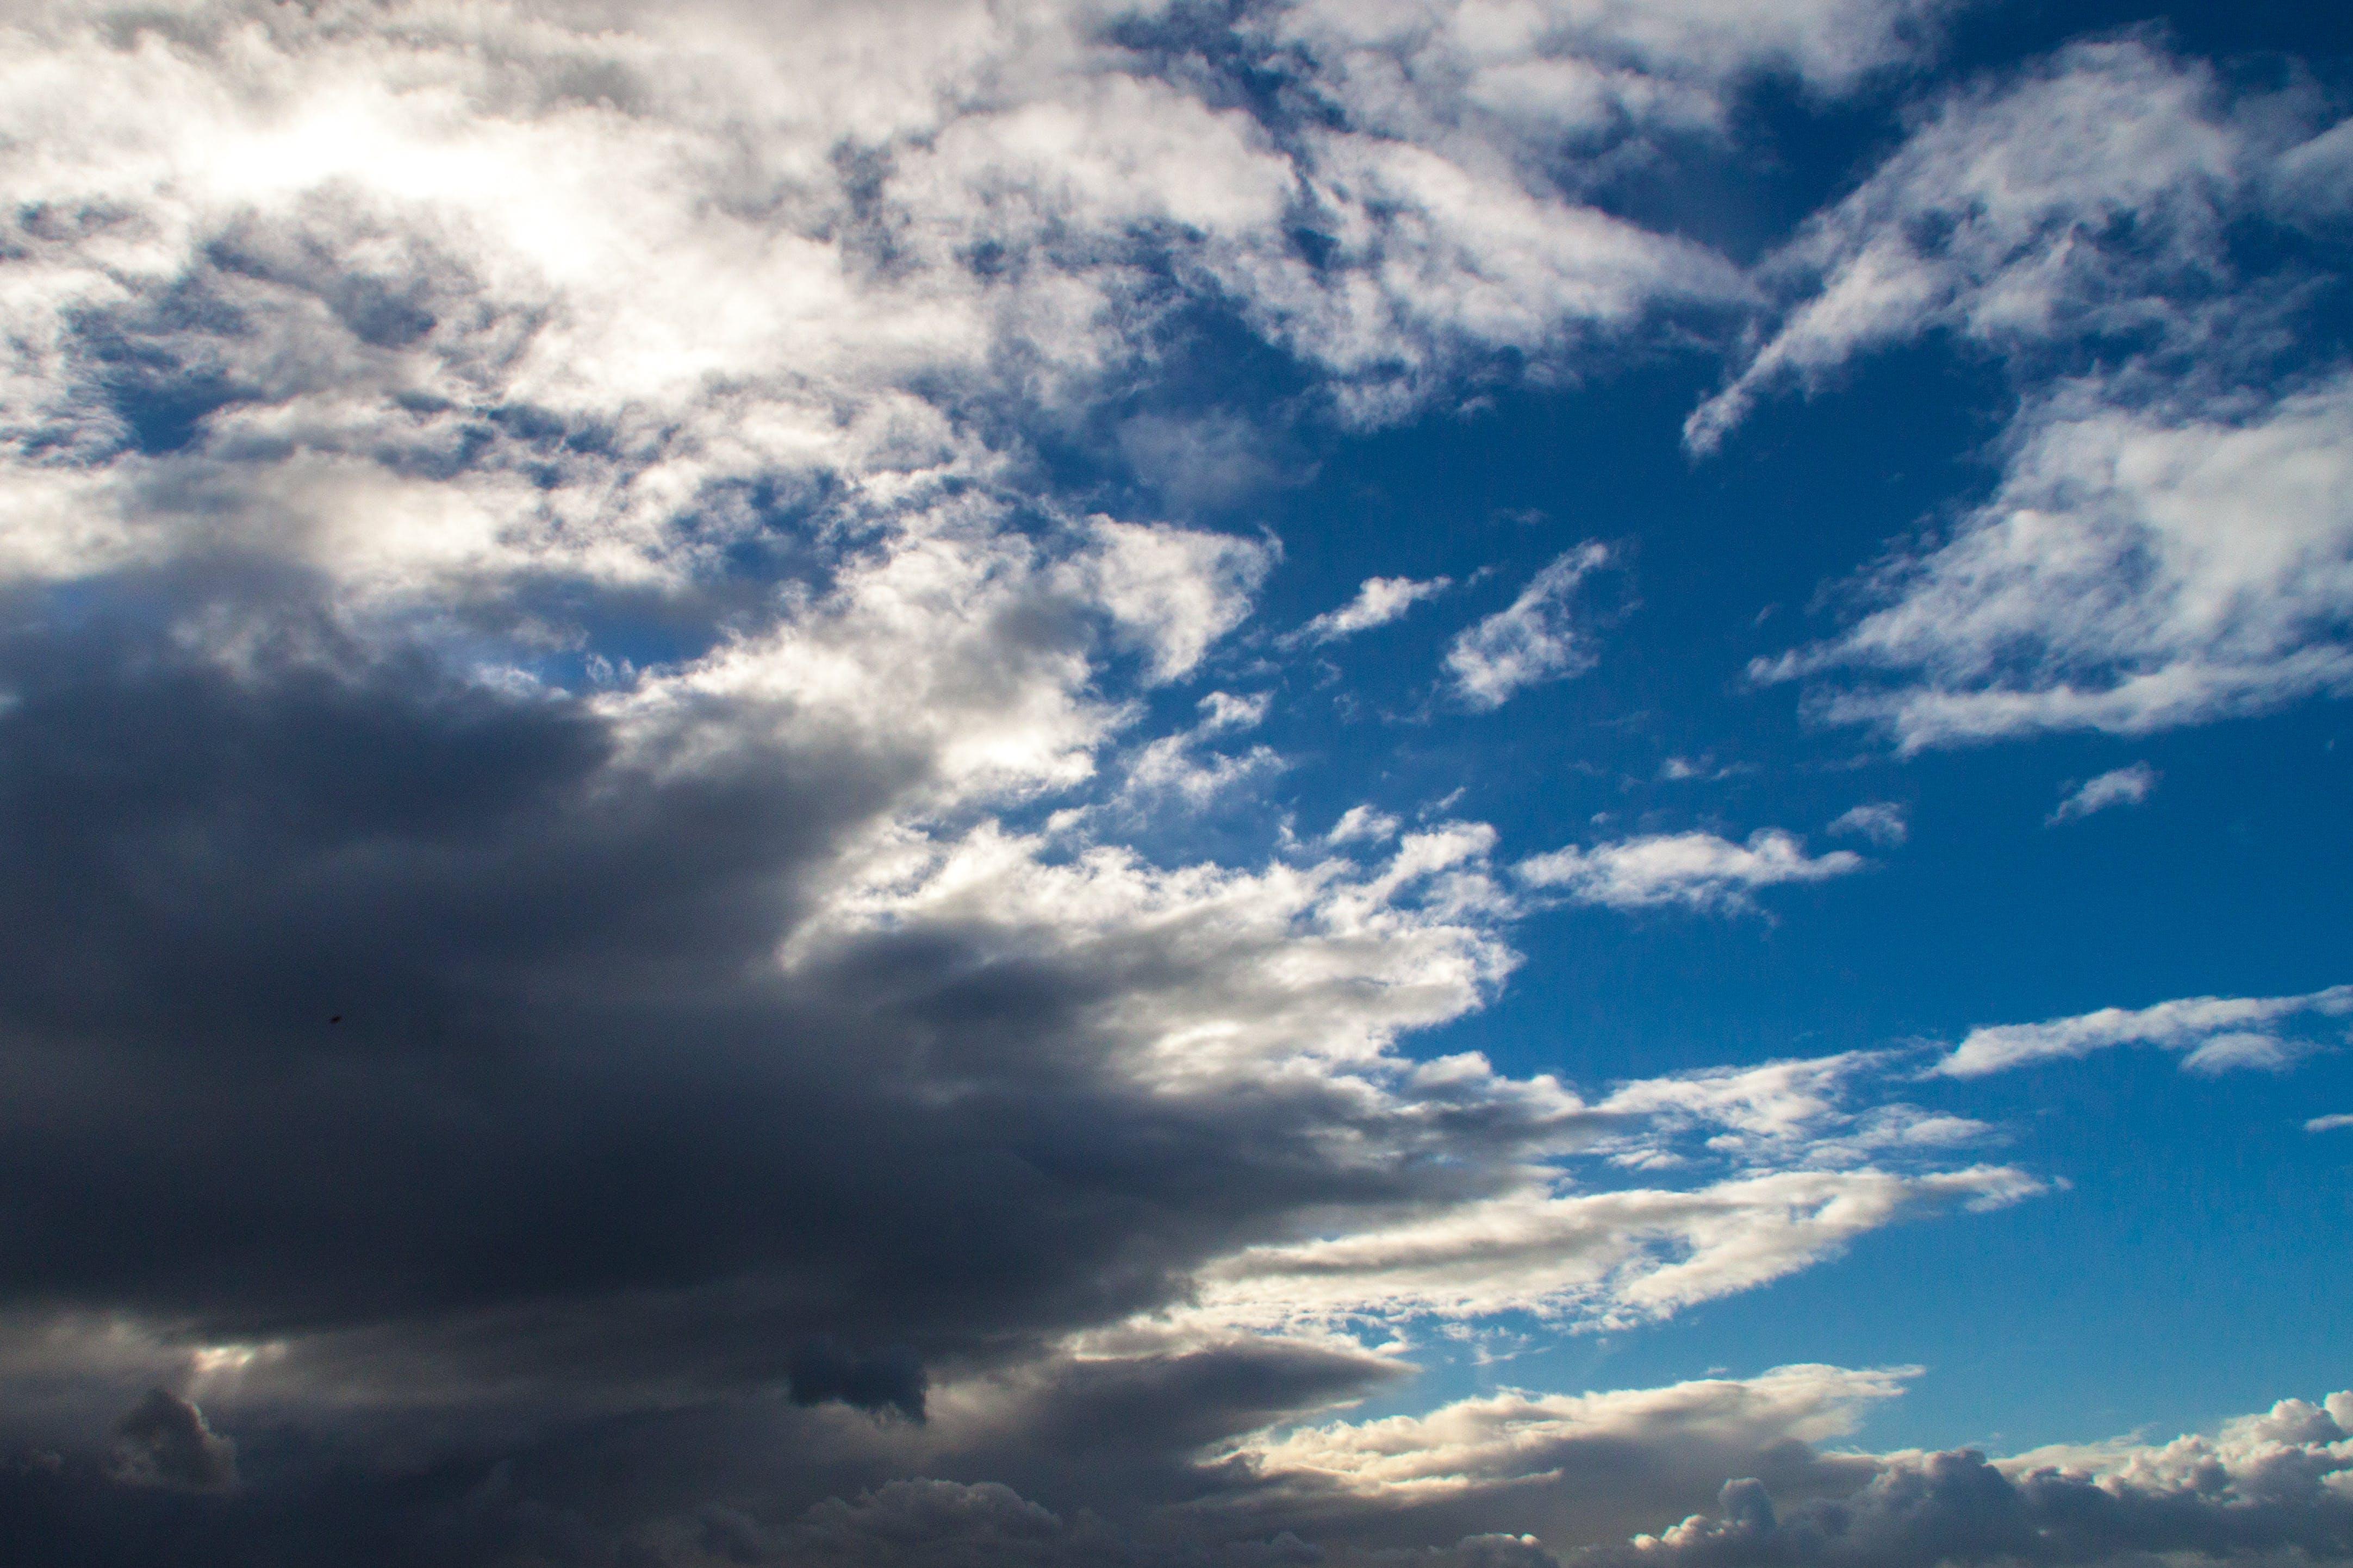 Free stock photo of blue, clouds, dark, dramatic sky